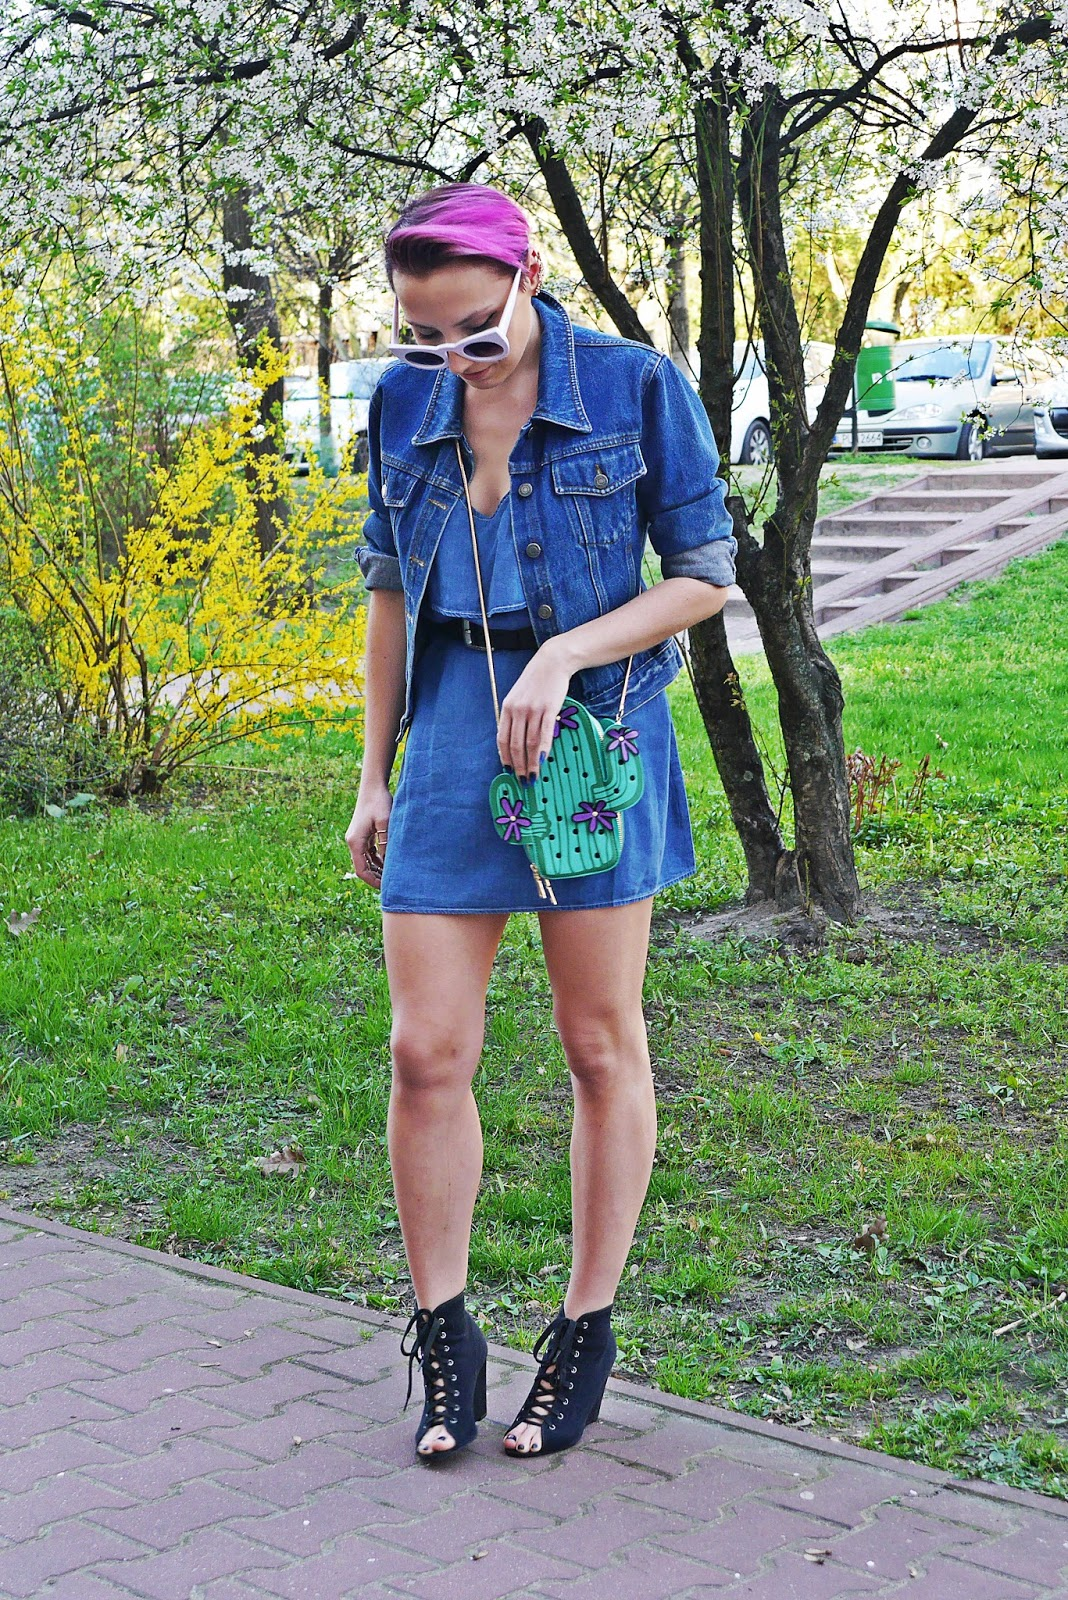 jeansowa_sukienka_torebka_kaktus_biale_okulary_koty_karyn_blog_120417b